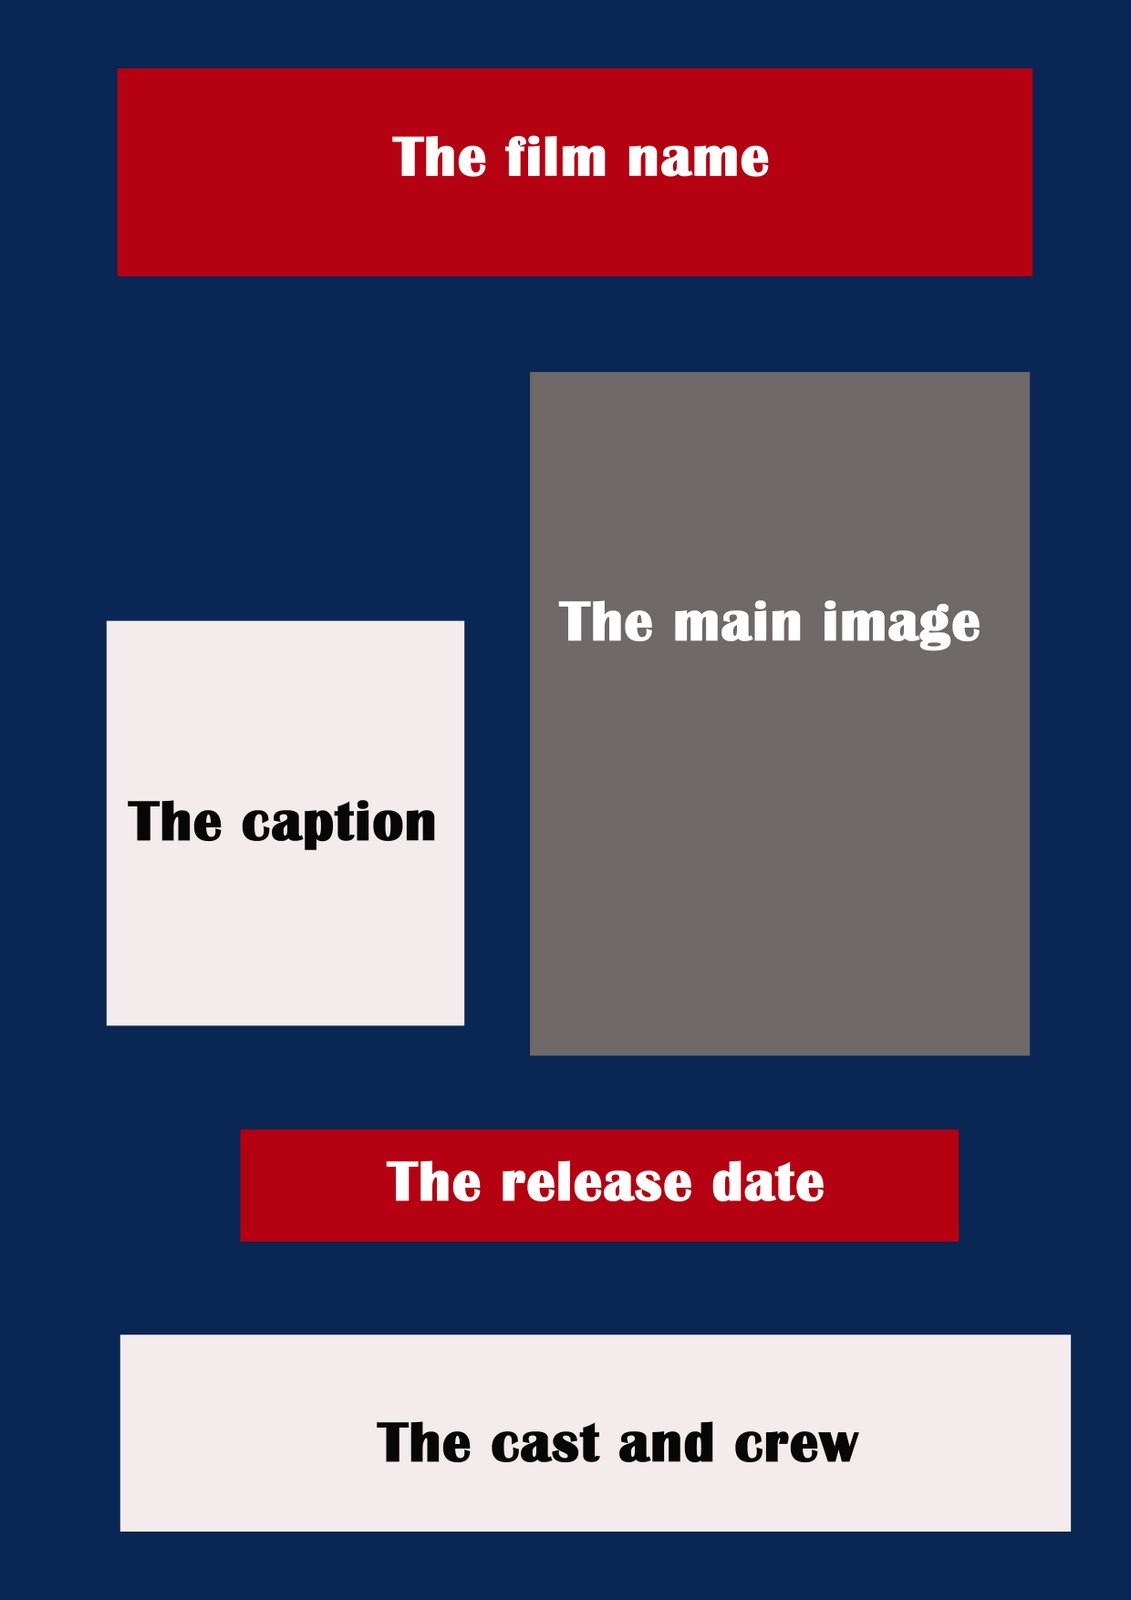 A2 Media Studiesjdh: Poster Template